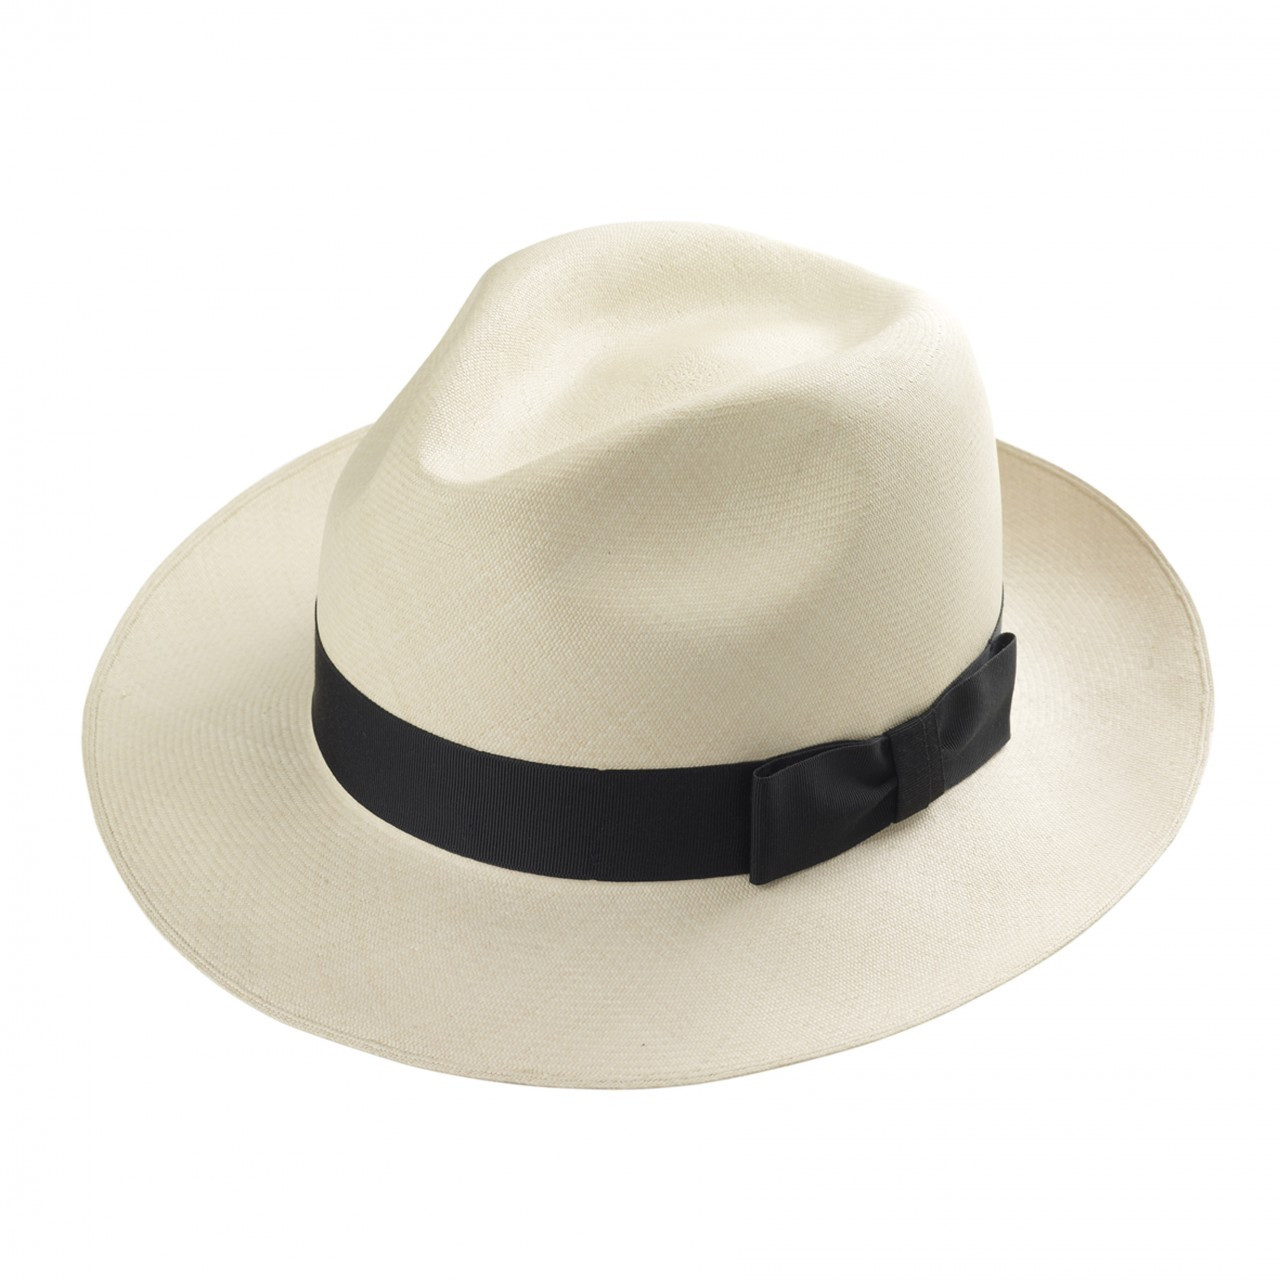 3266941a Montecristi Superfino Panama - from £500 - The Panama Hat Company